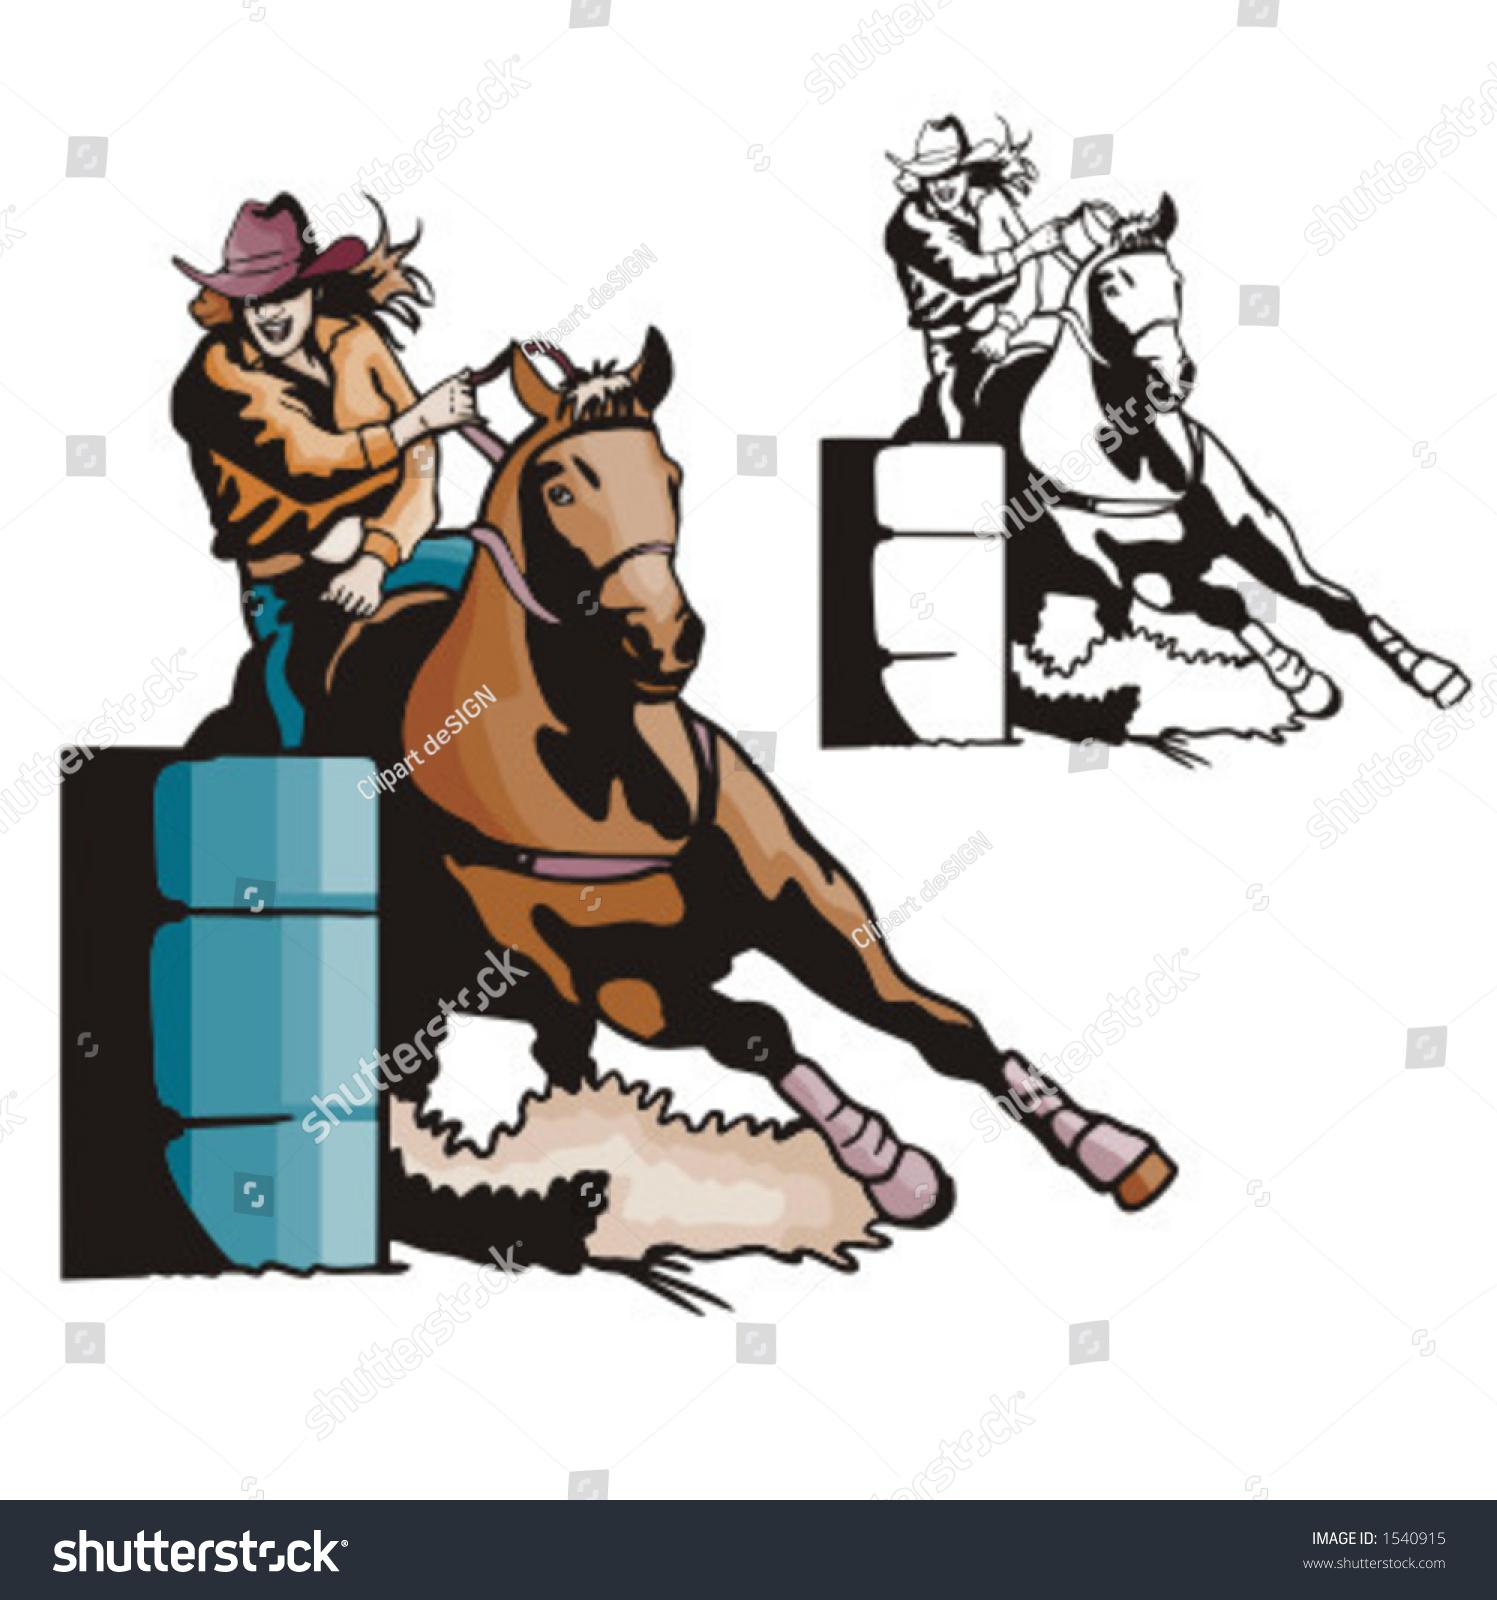 hight resolution of illustration of a ladies barrel racing